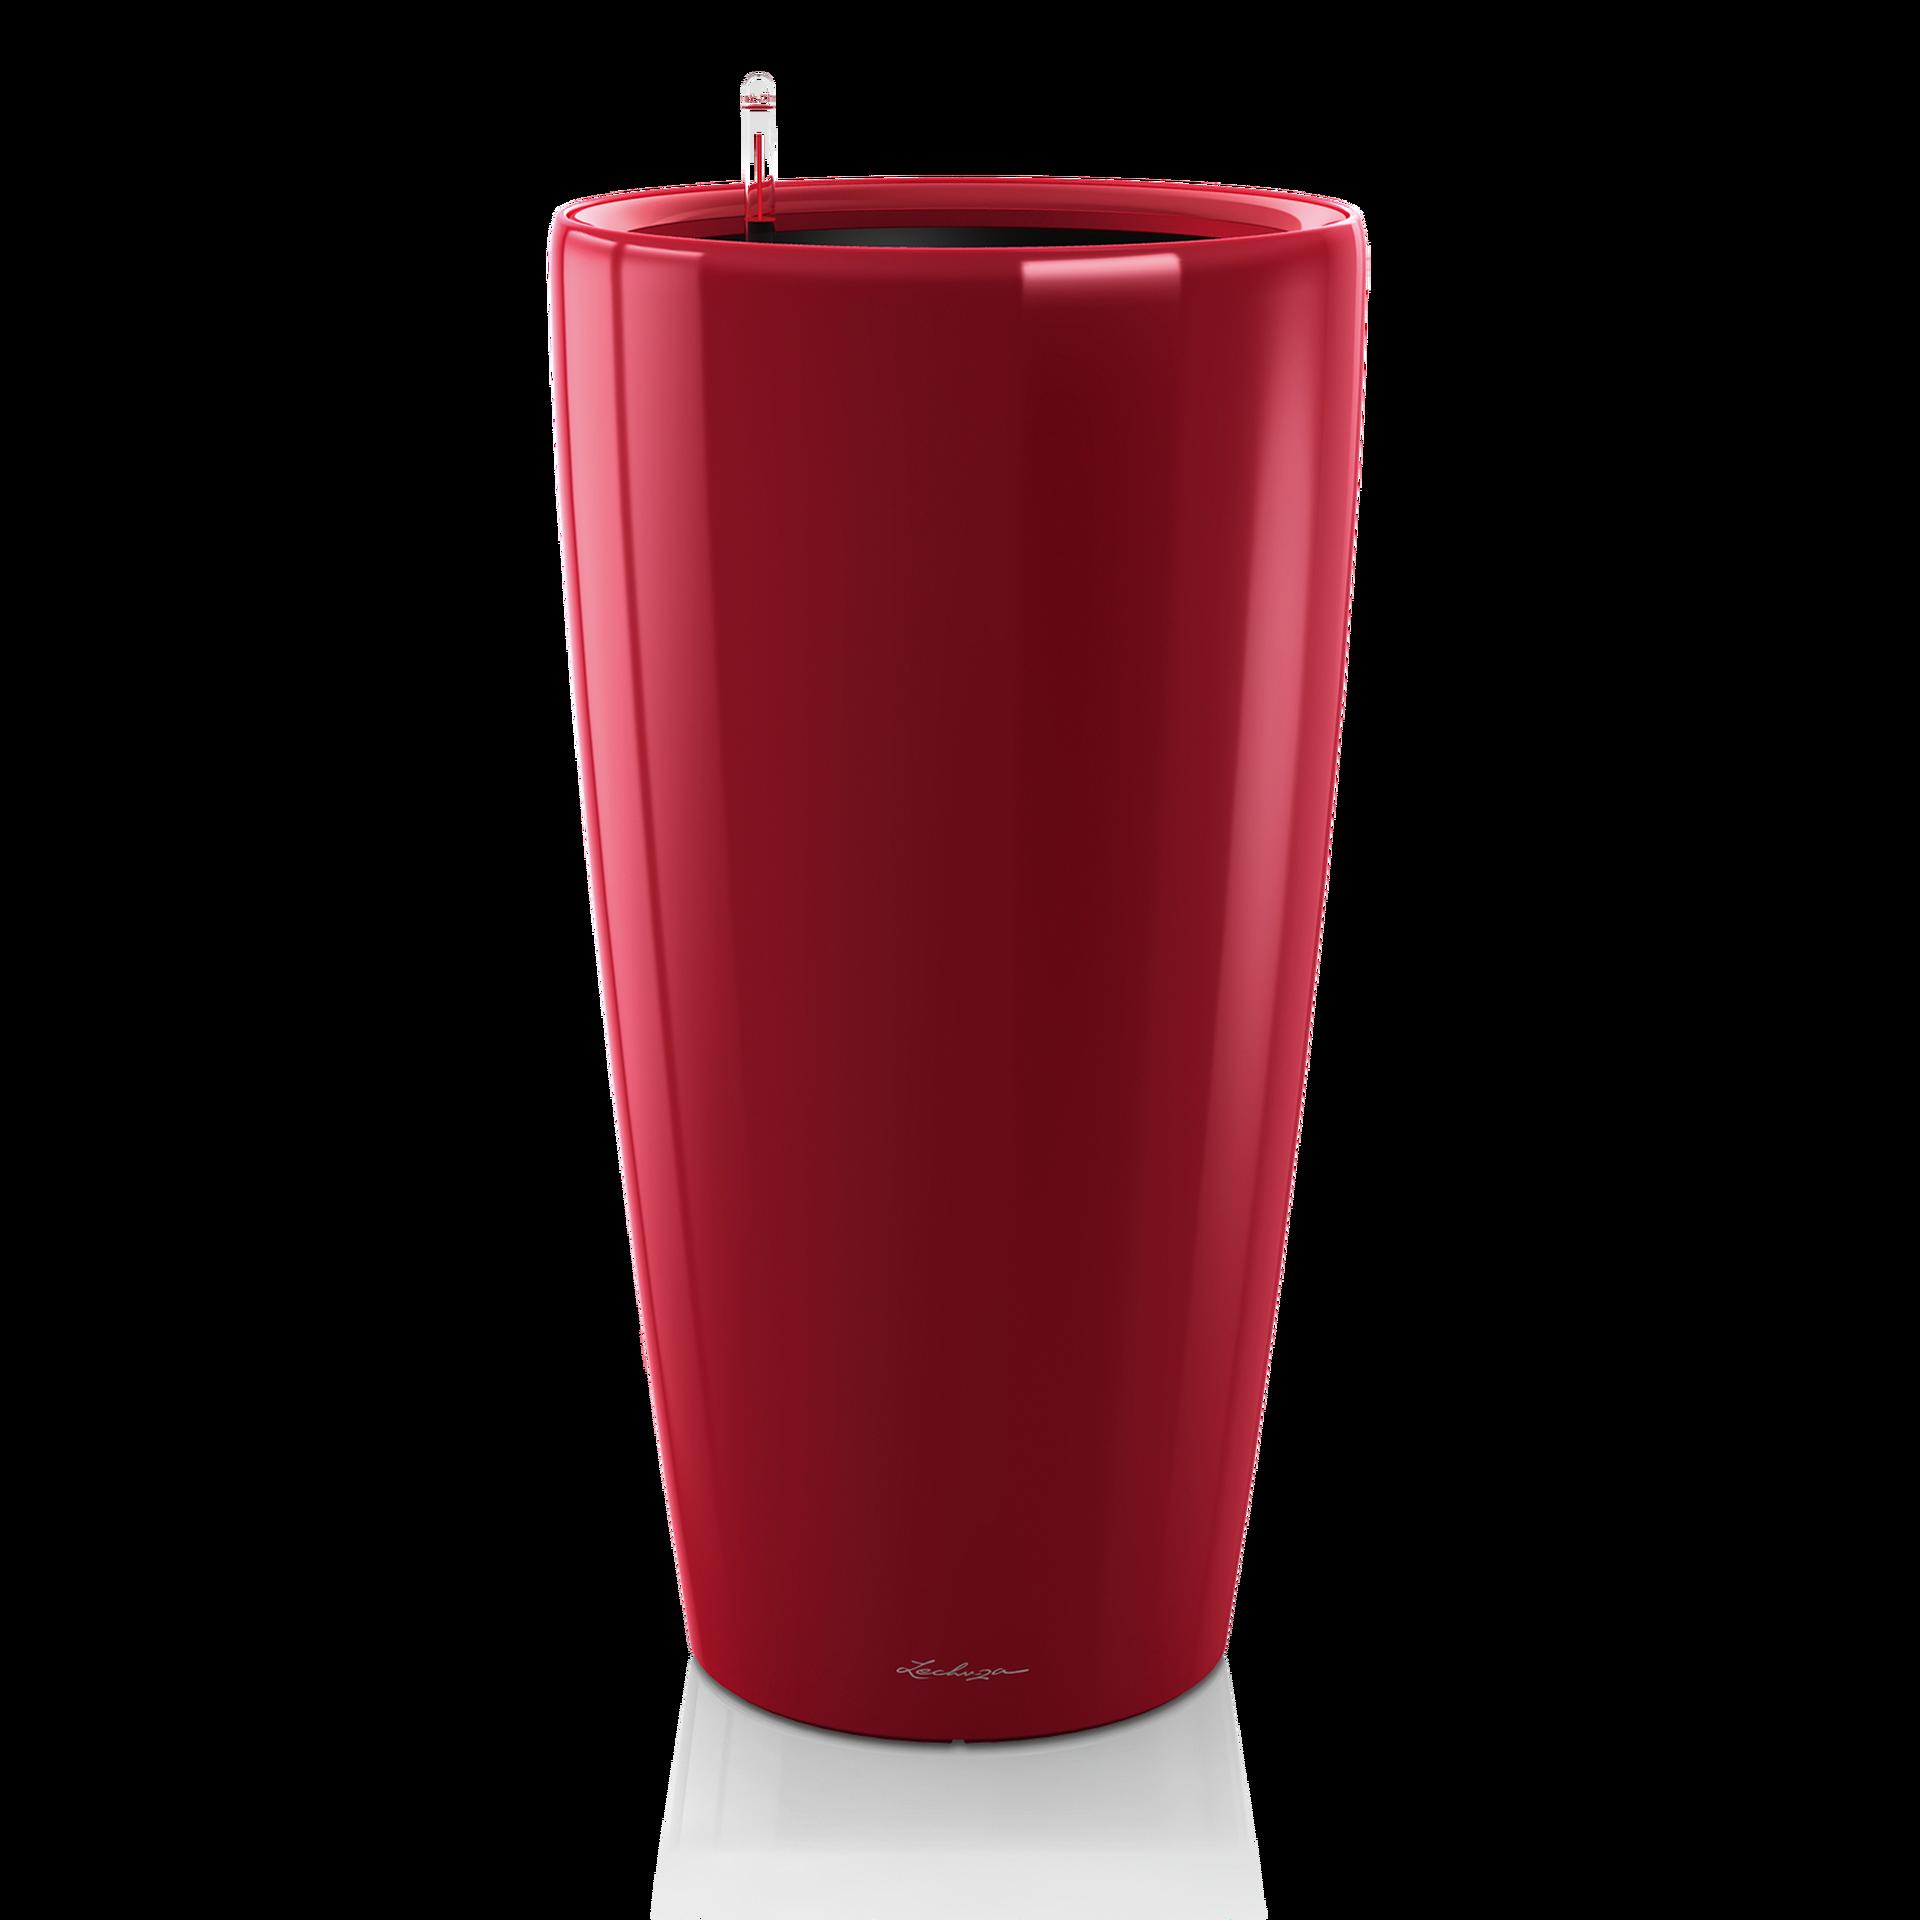 RONDO 40 scarlet rot hochglanz